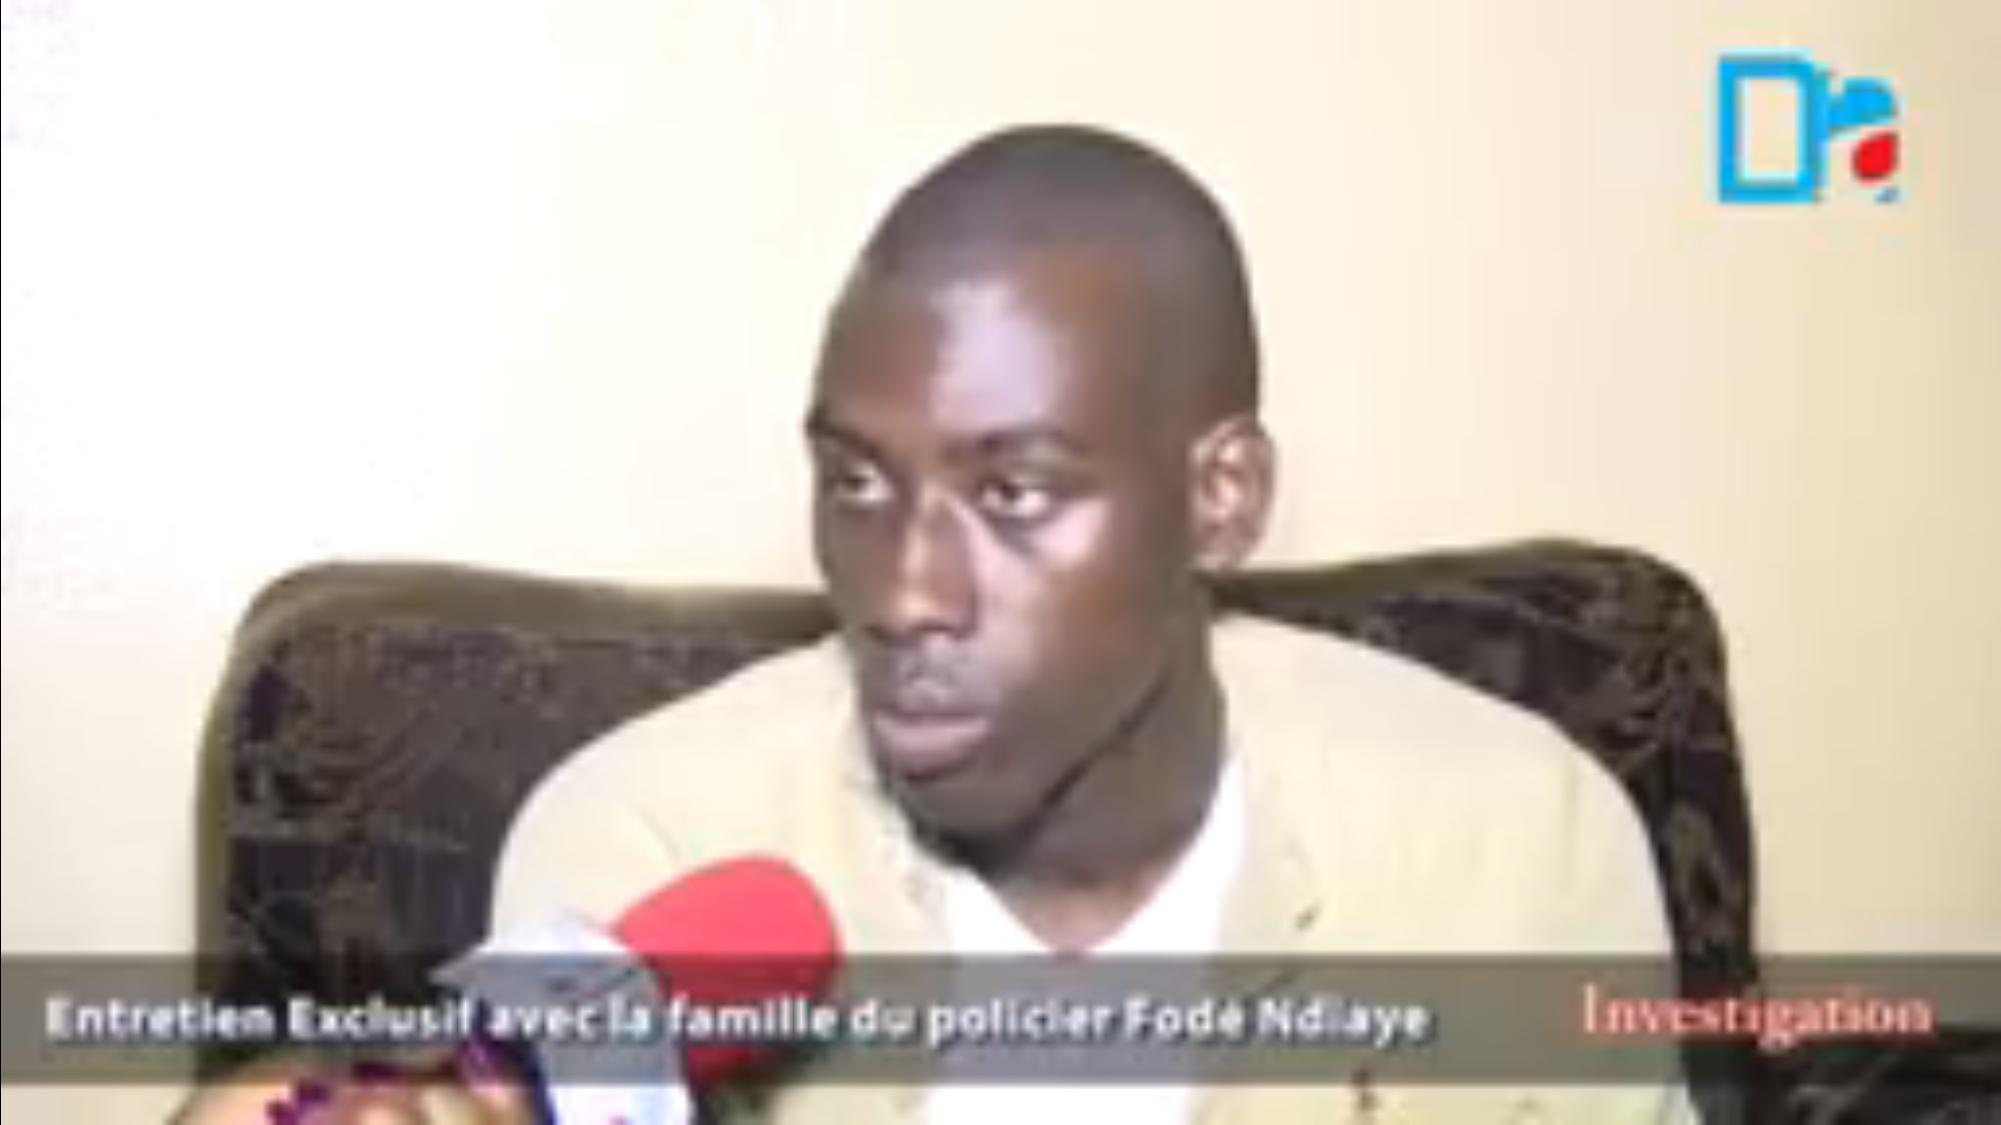 "El hadj Malick M'boup, ami de Fodé N'diaye : "" La lumière sera faite dans l'affaire Fodé N'diaye (...) On ne va plus rester silencieux..."""